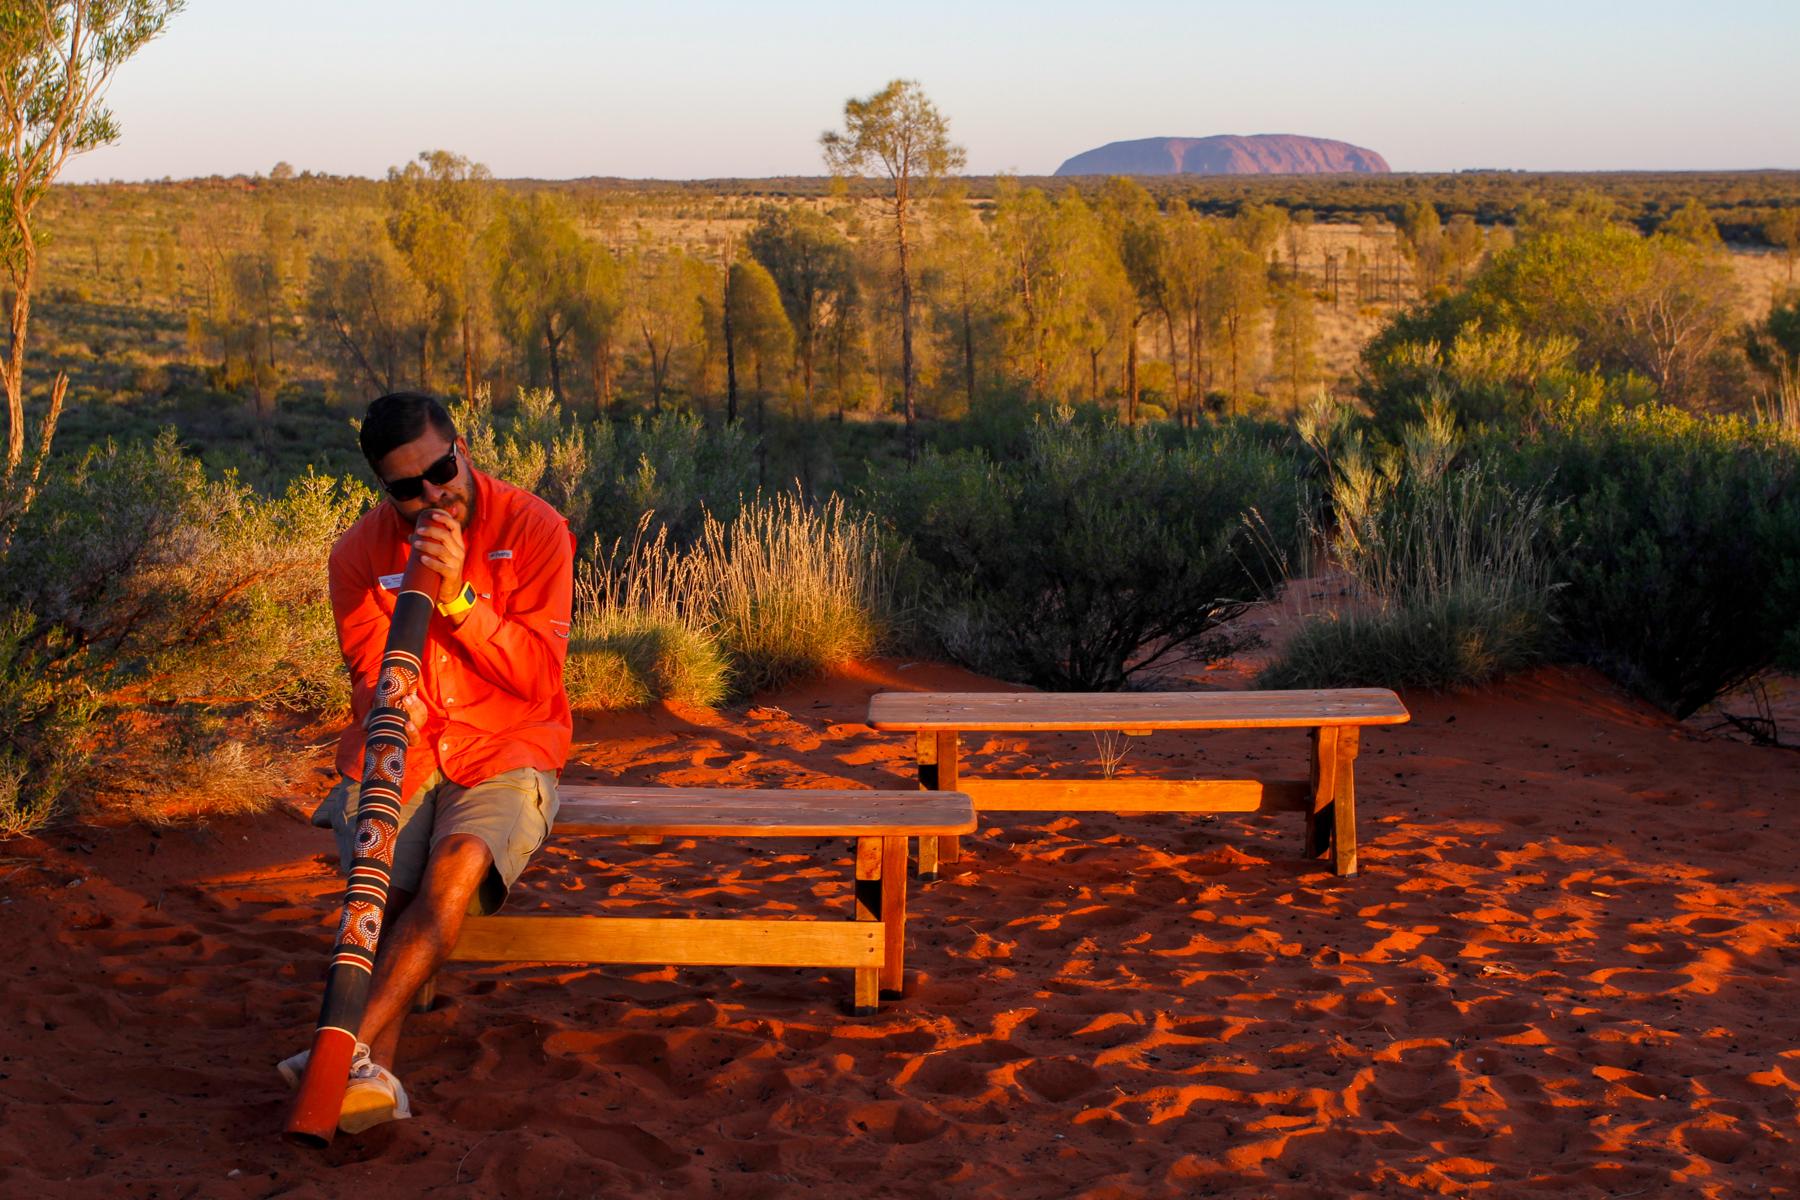 mg 1791 lr What to do in Uluru